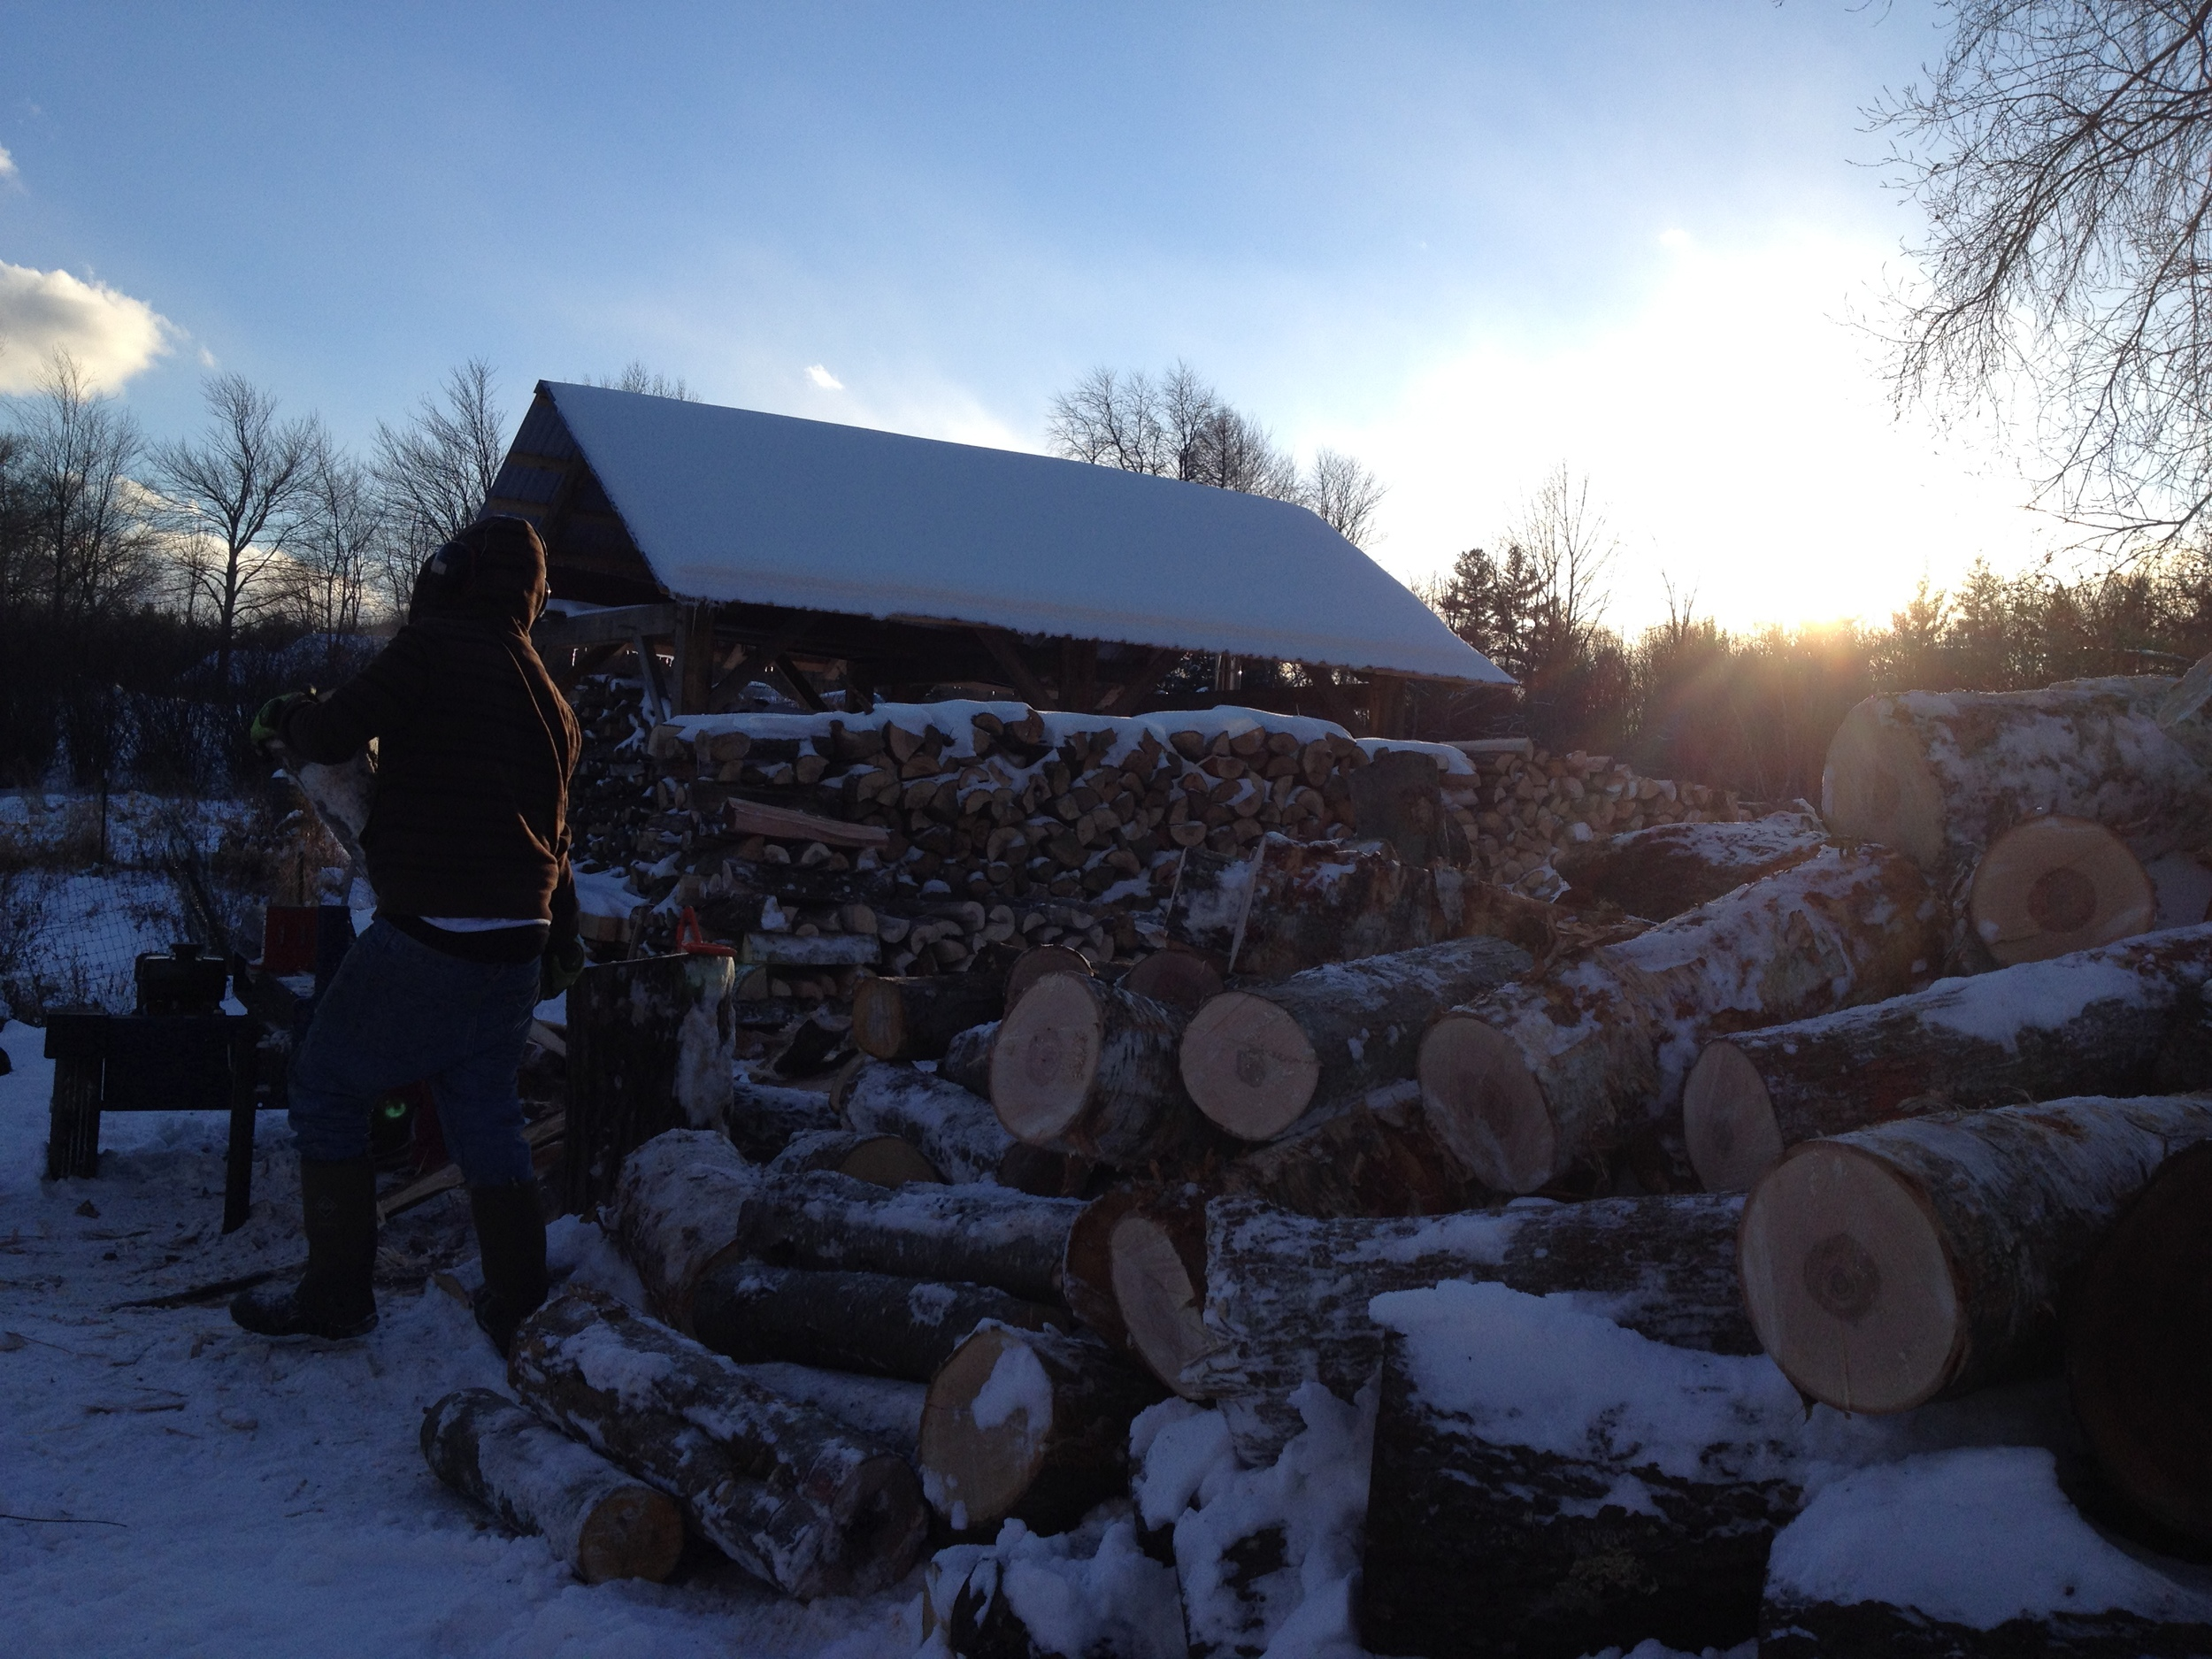 Splittin' and stackin' cordwood til the sun goes down.